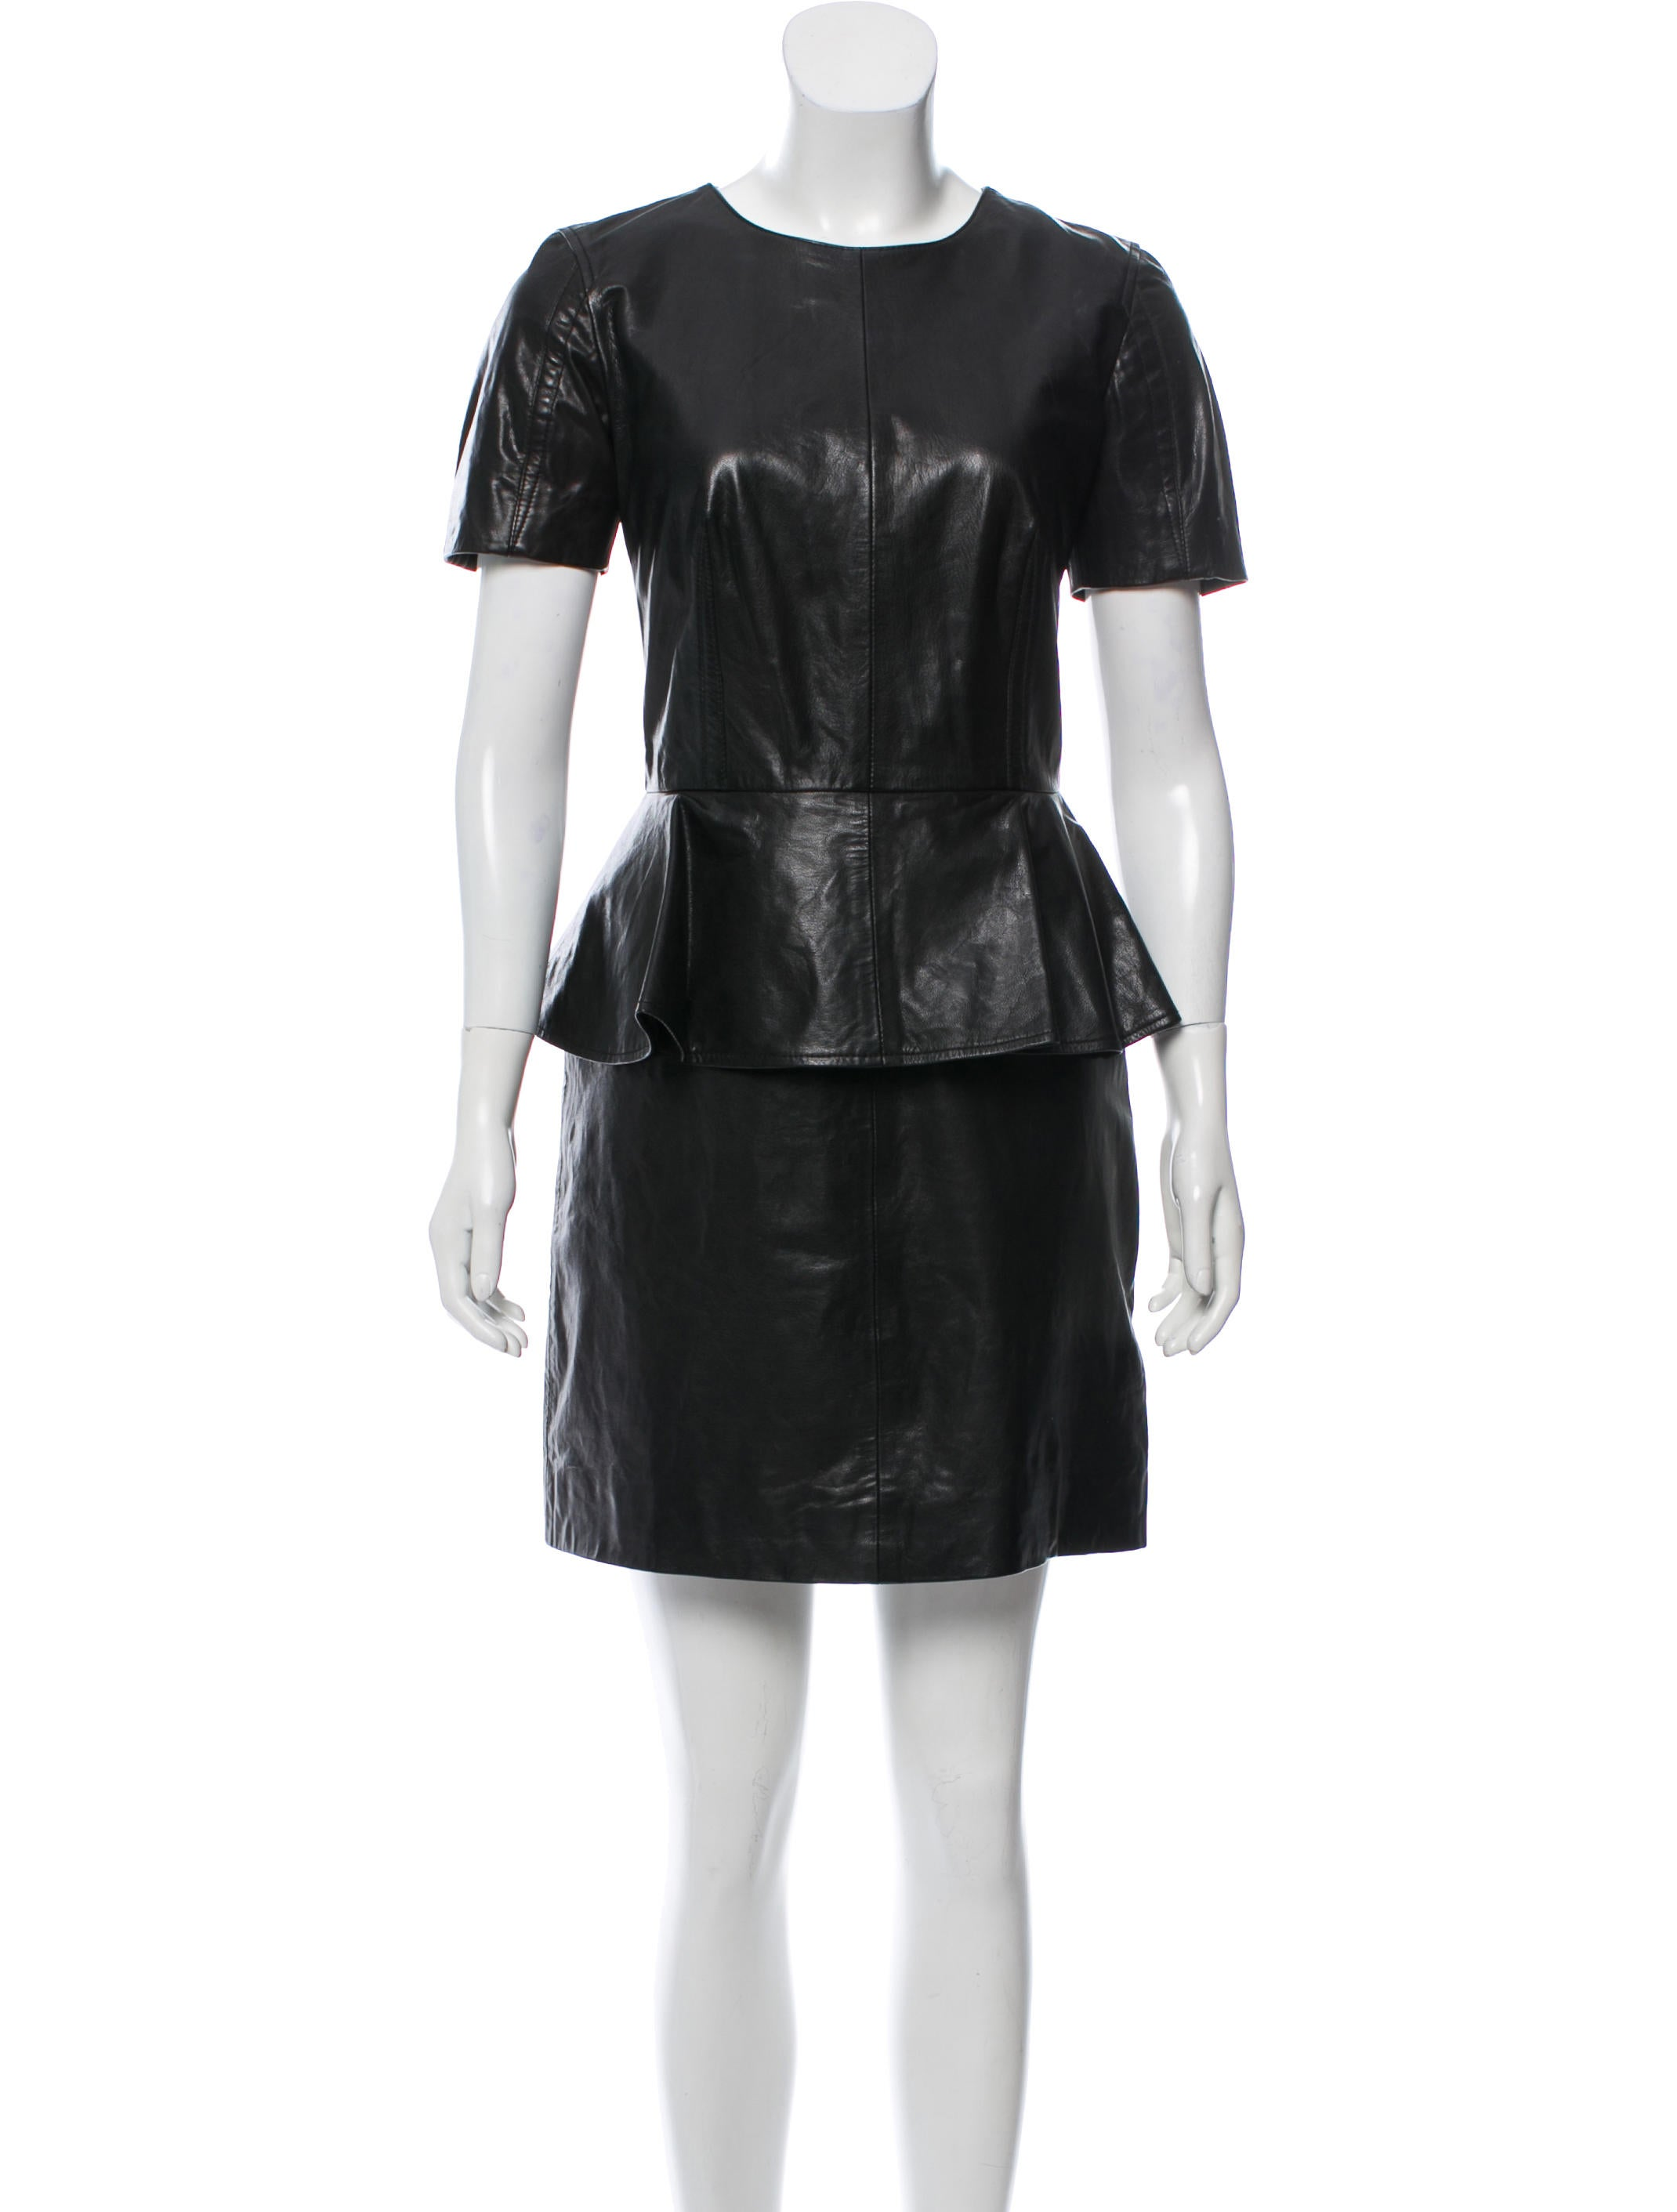 cb8585b8df11d McQ Alexander McQueen Leather Mini Dress - Clothing - WMQ26998 | The ...